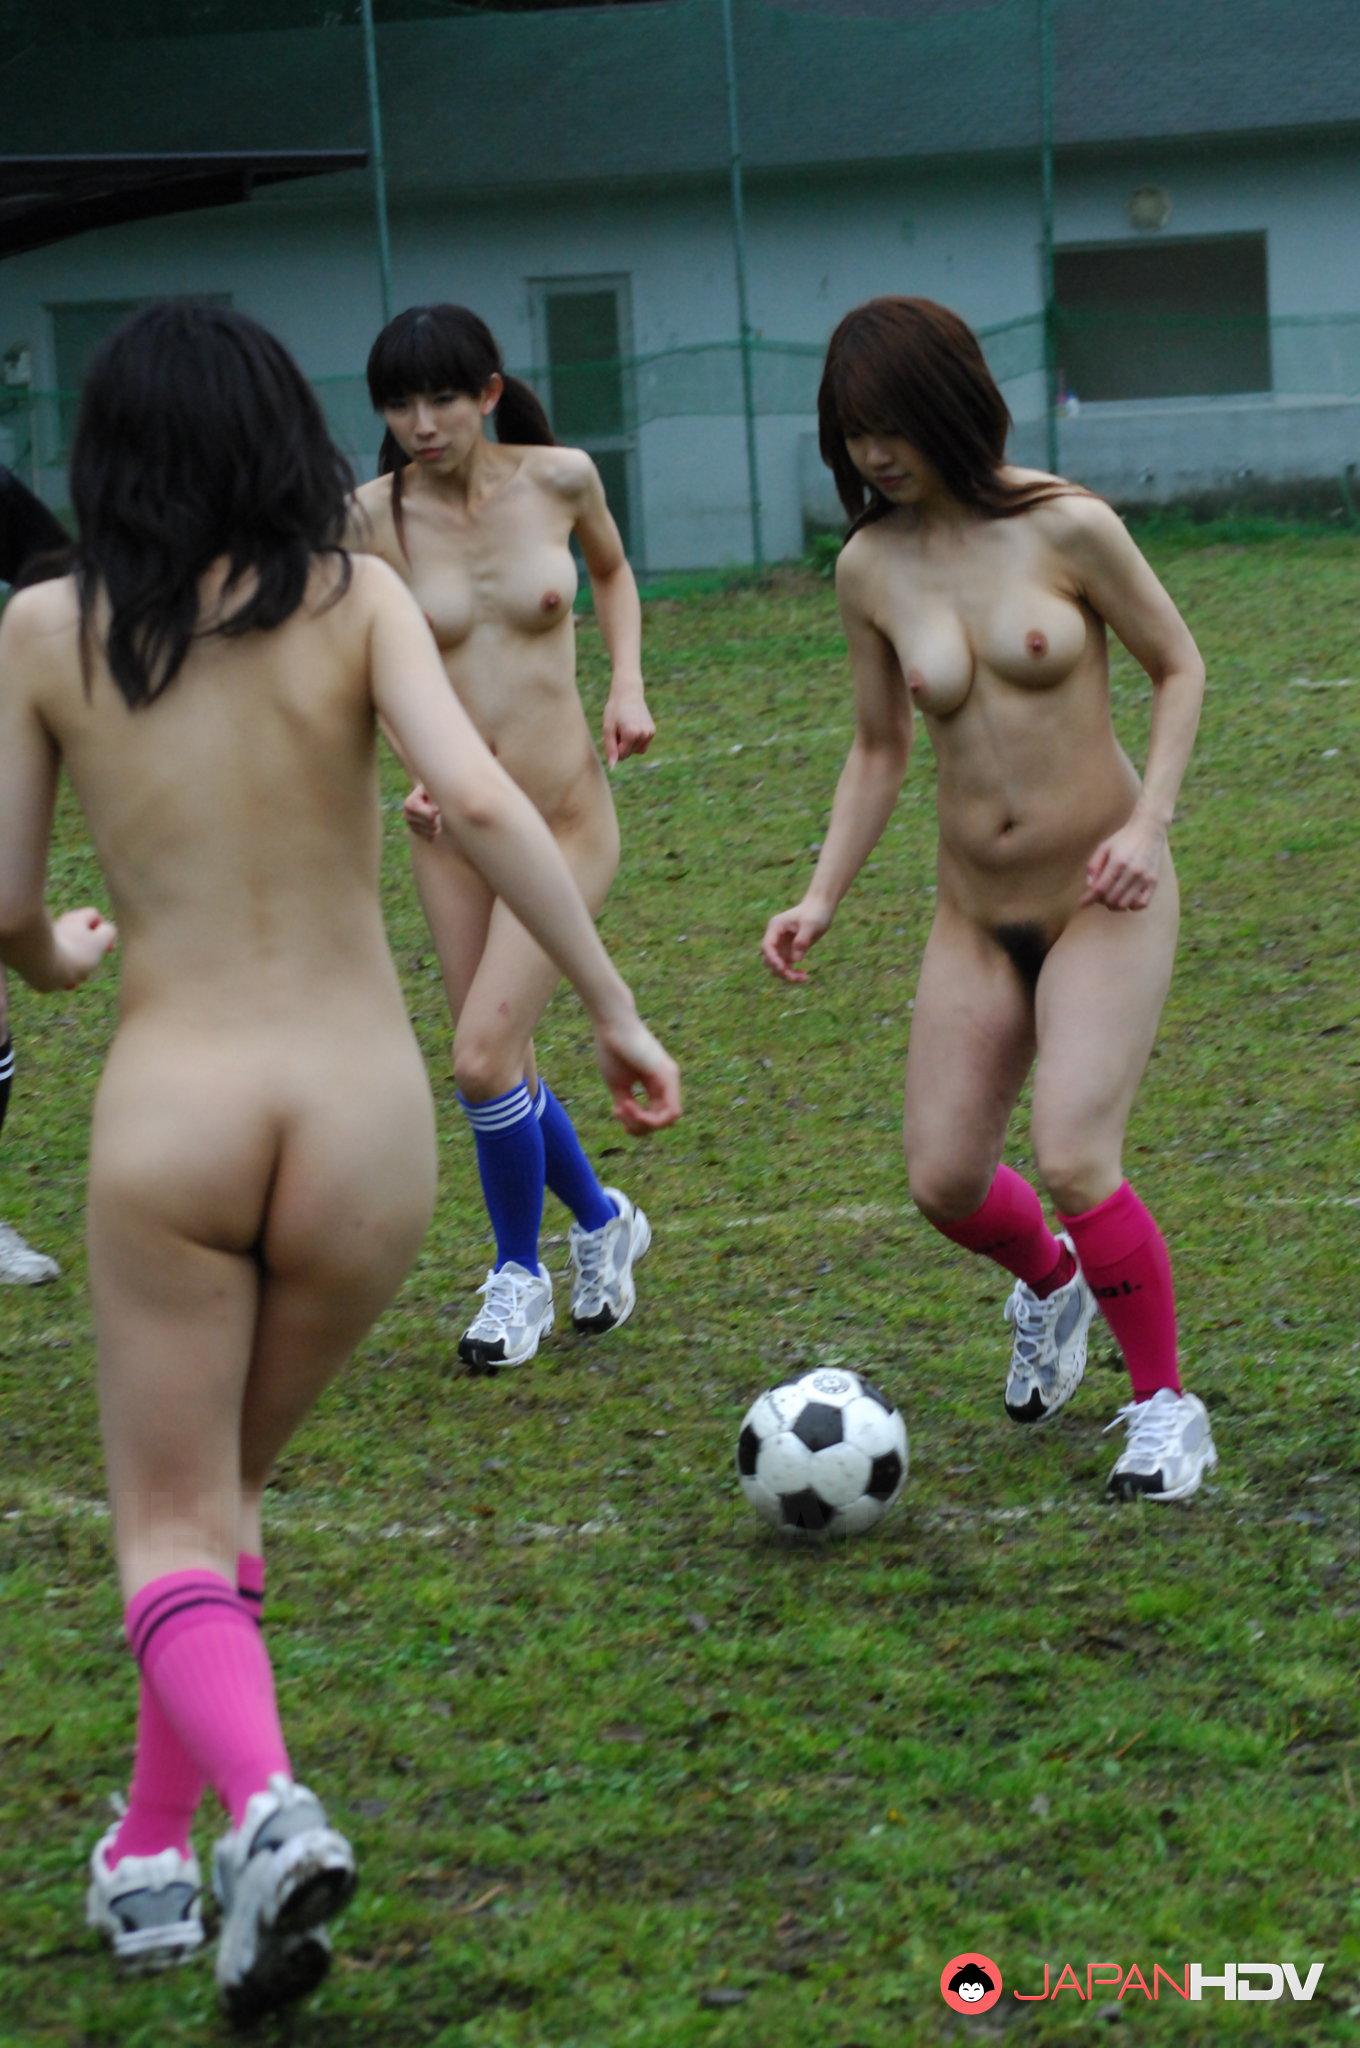 japanese girls playing soccer totally naked | japan hdv